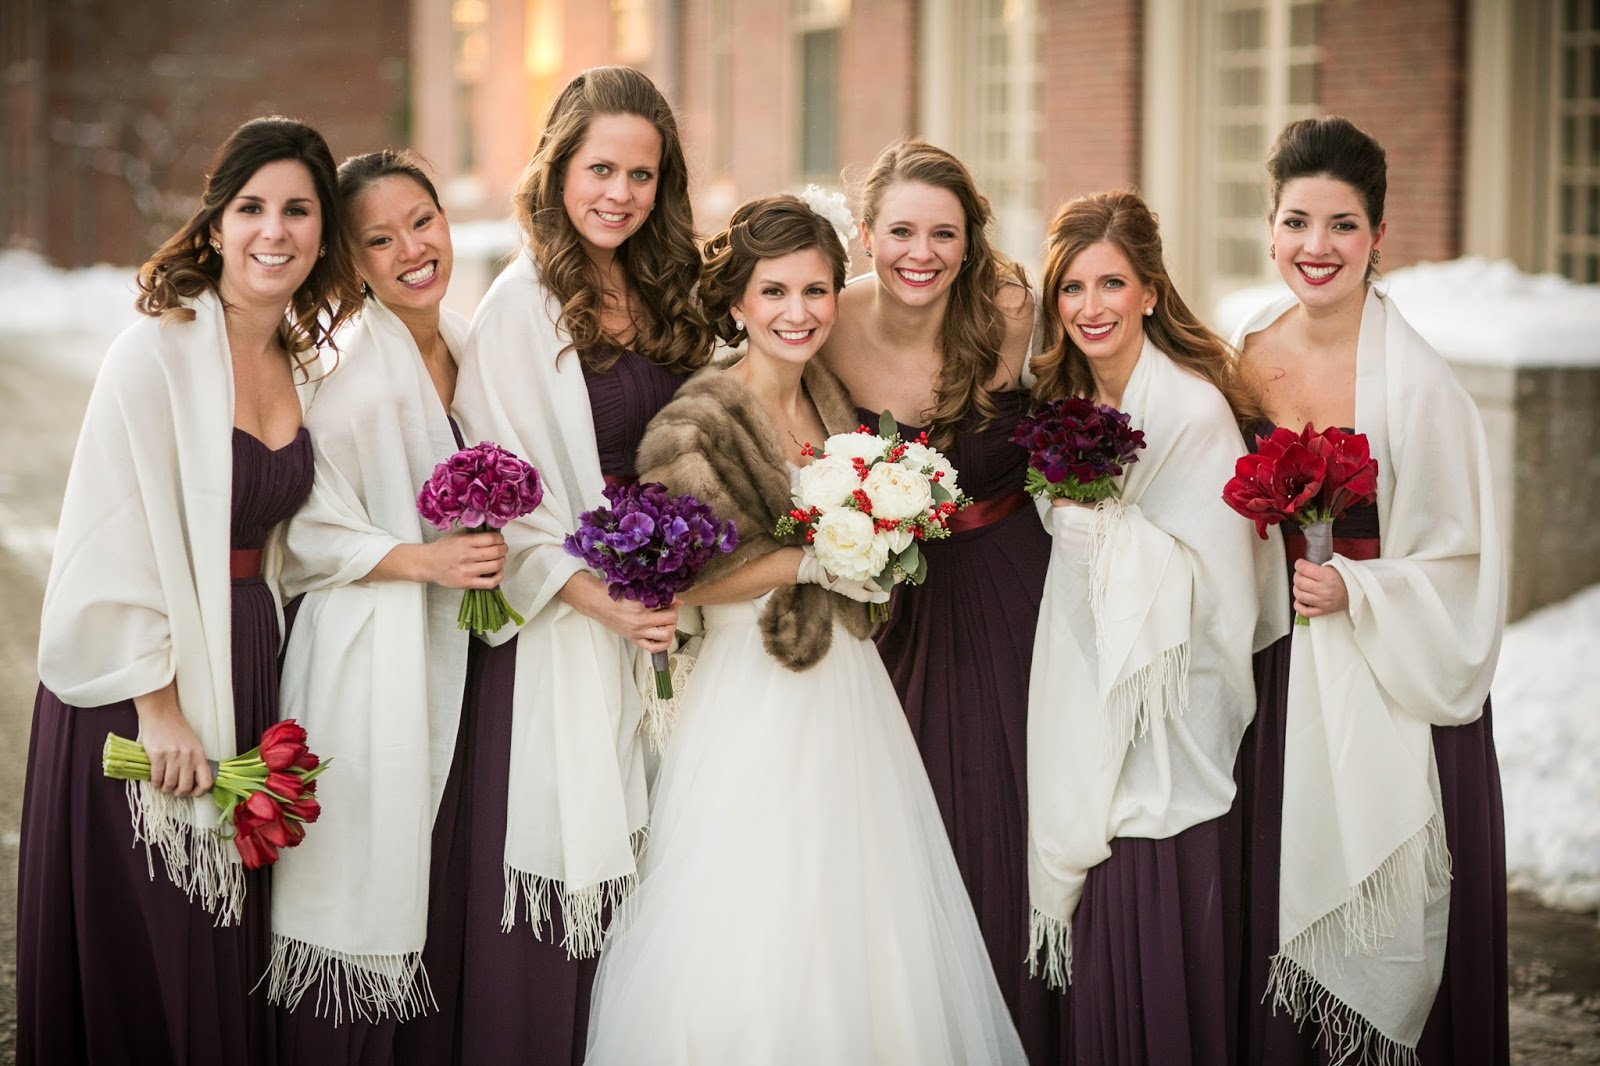 bridesmaids in purple : red & purple flowers : winter wedding : saint augustine parish : les fleurs : zev fisher photography